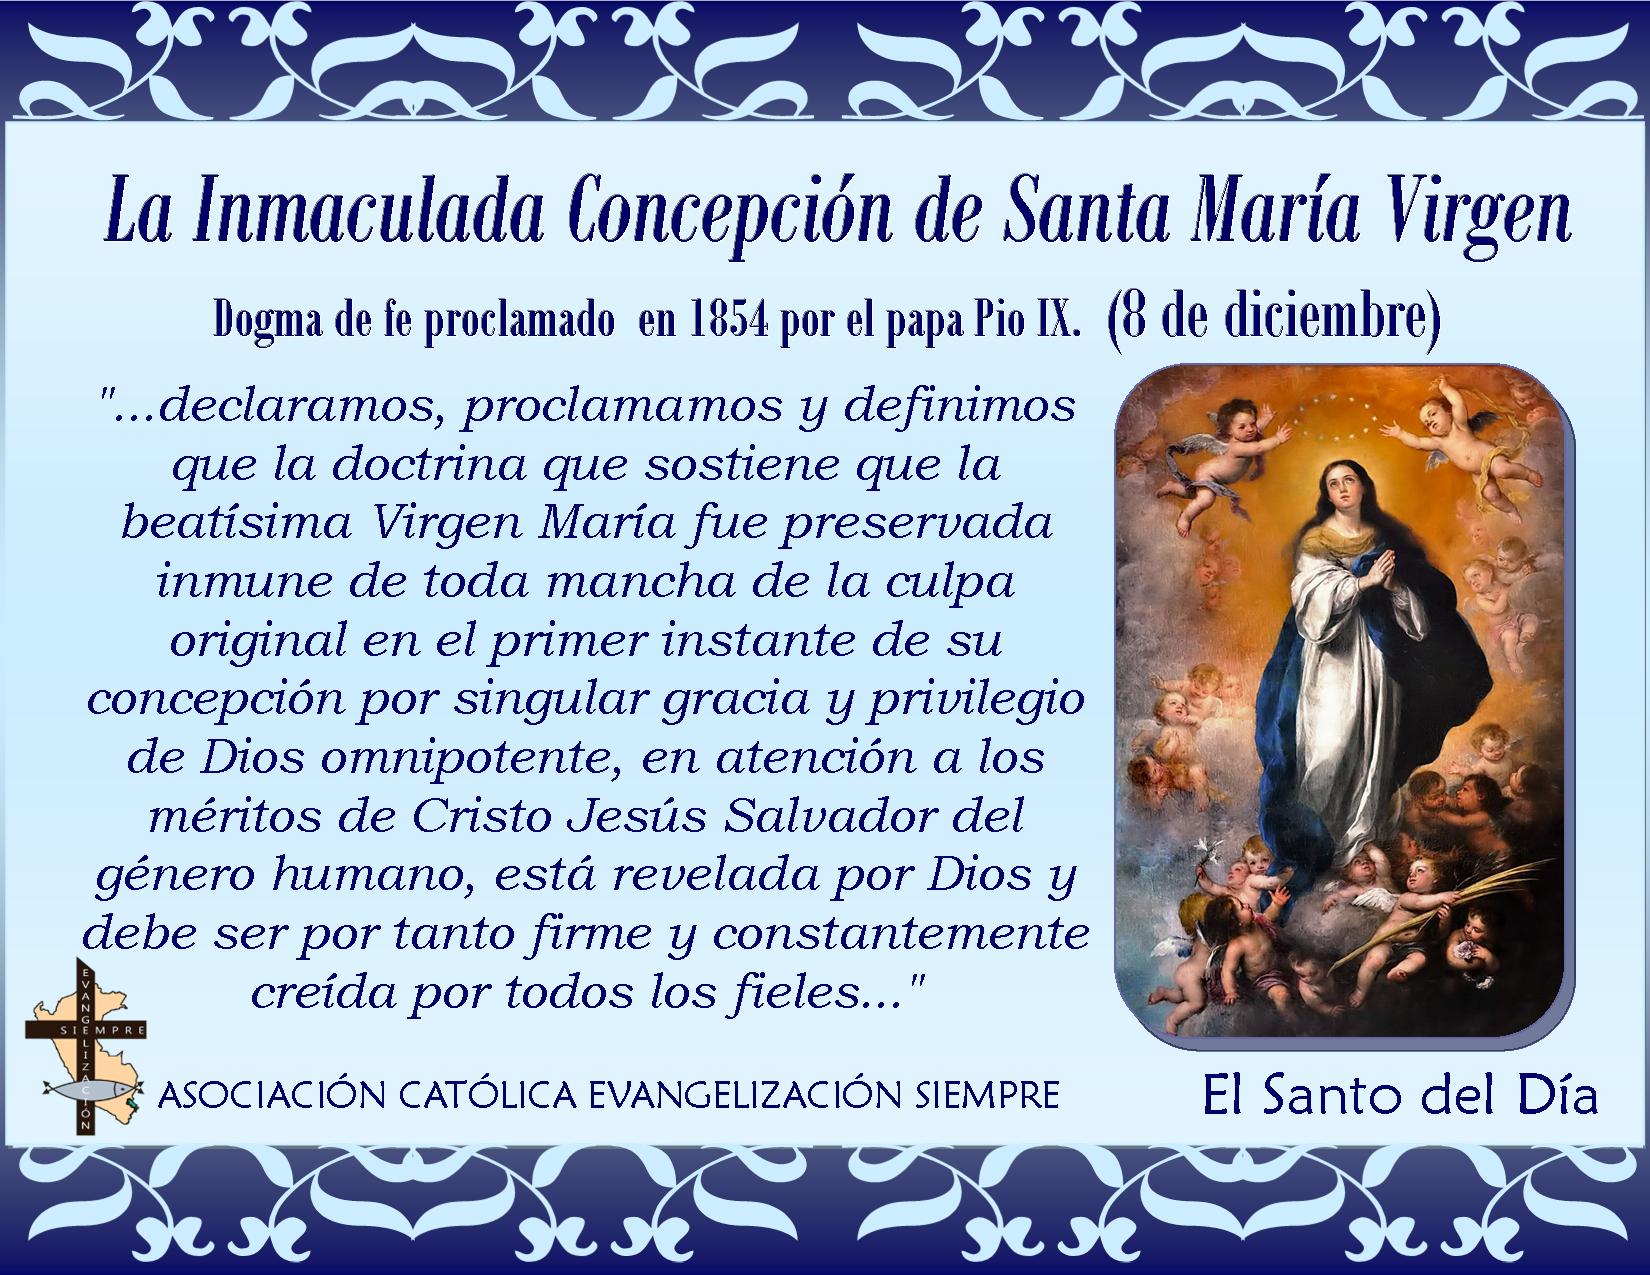 santo-del-dia-8-diciembre